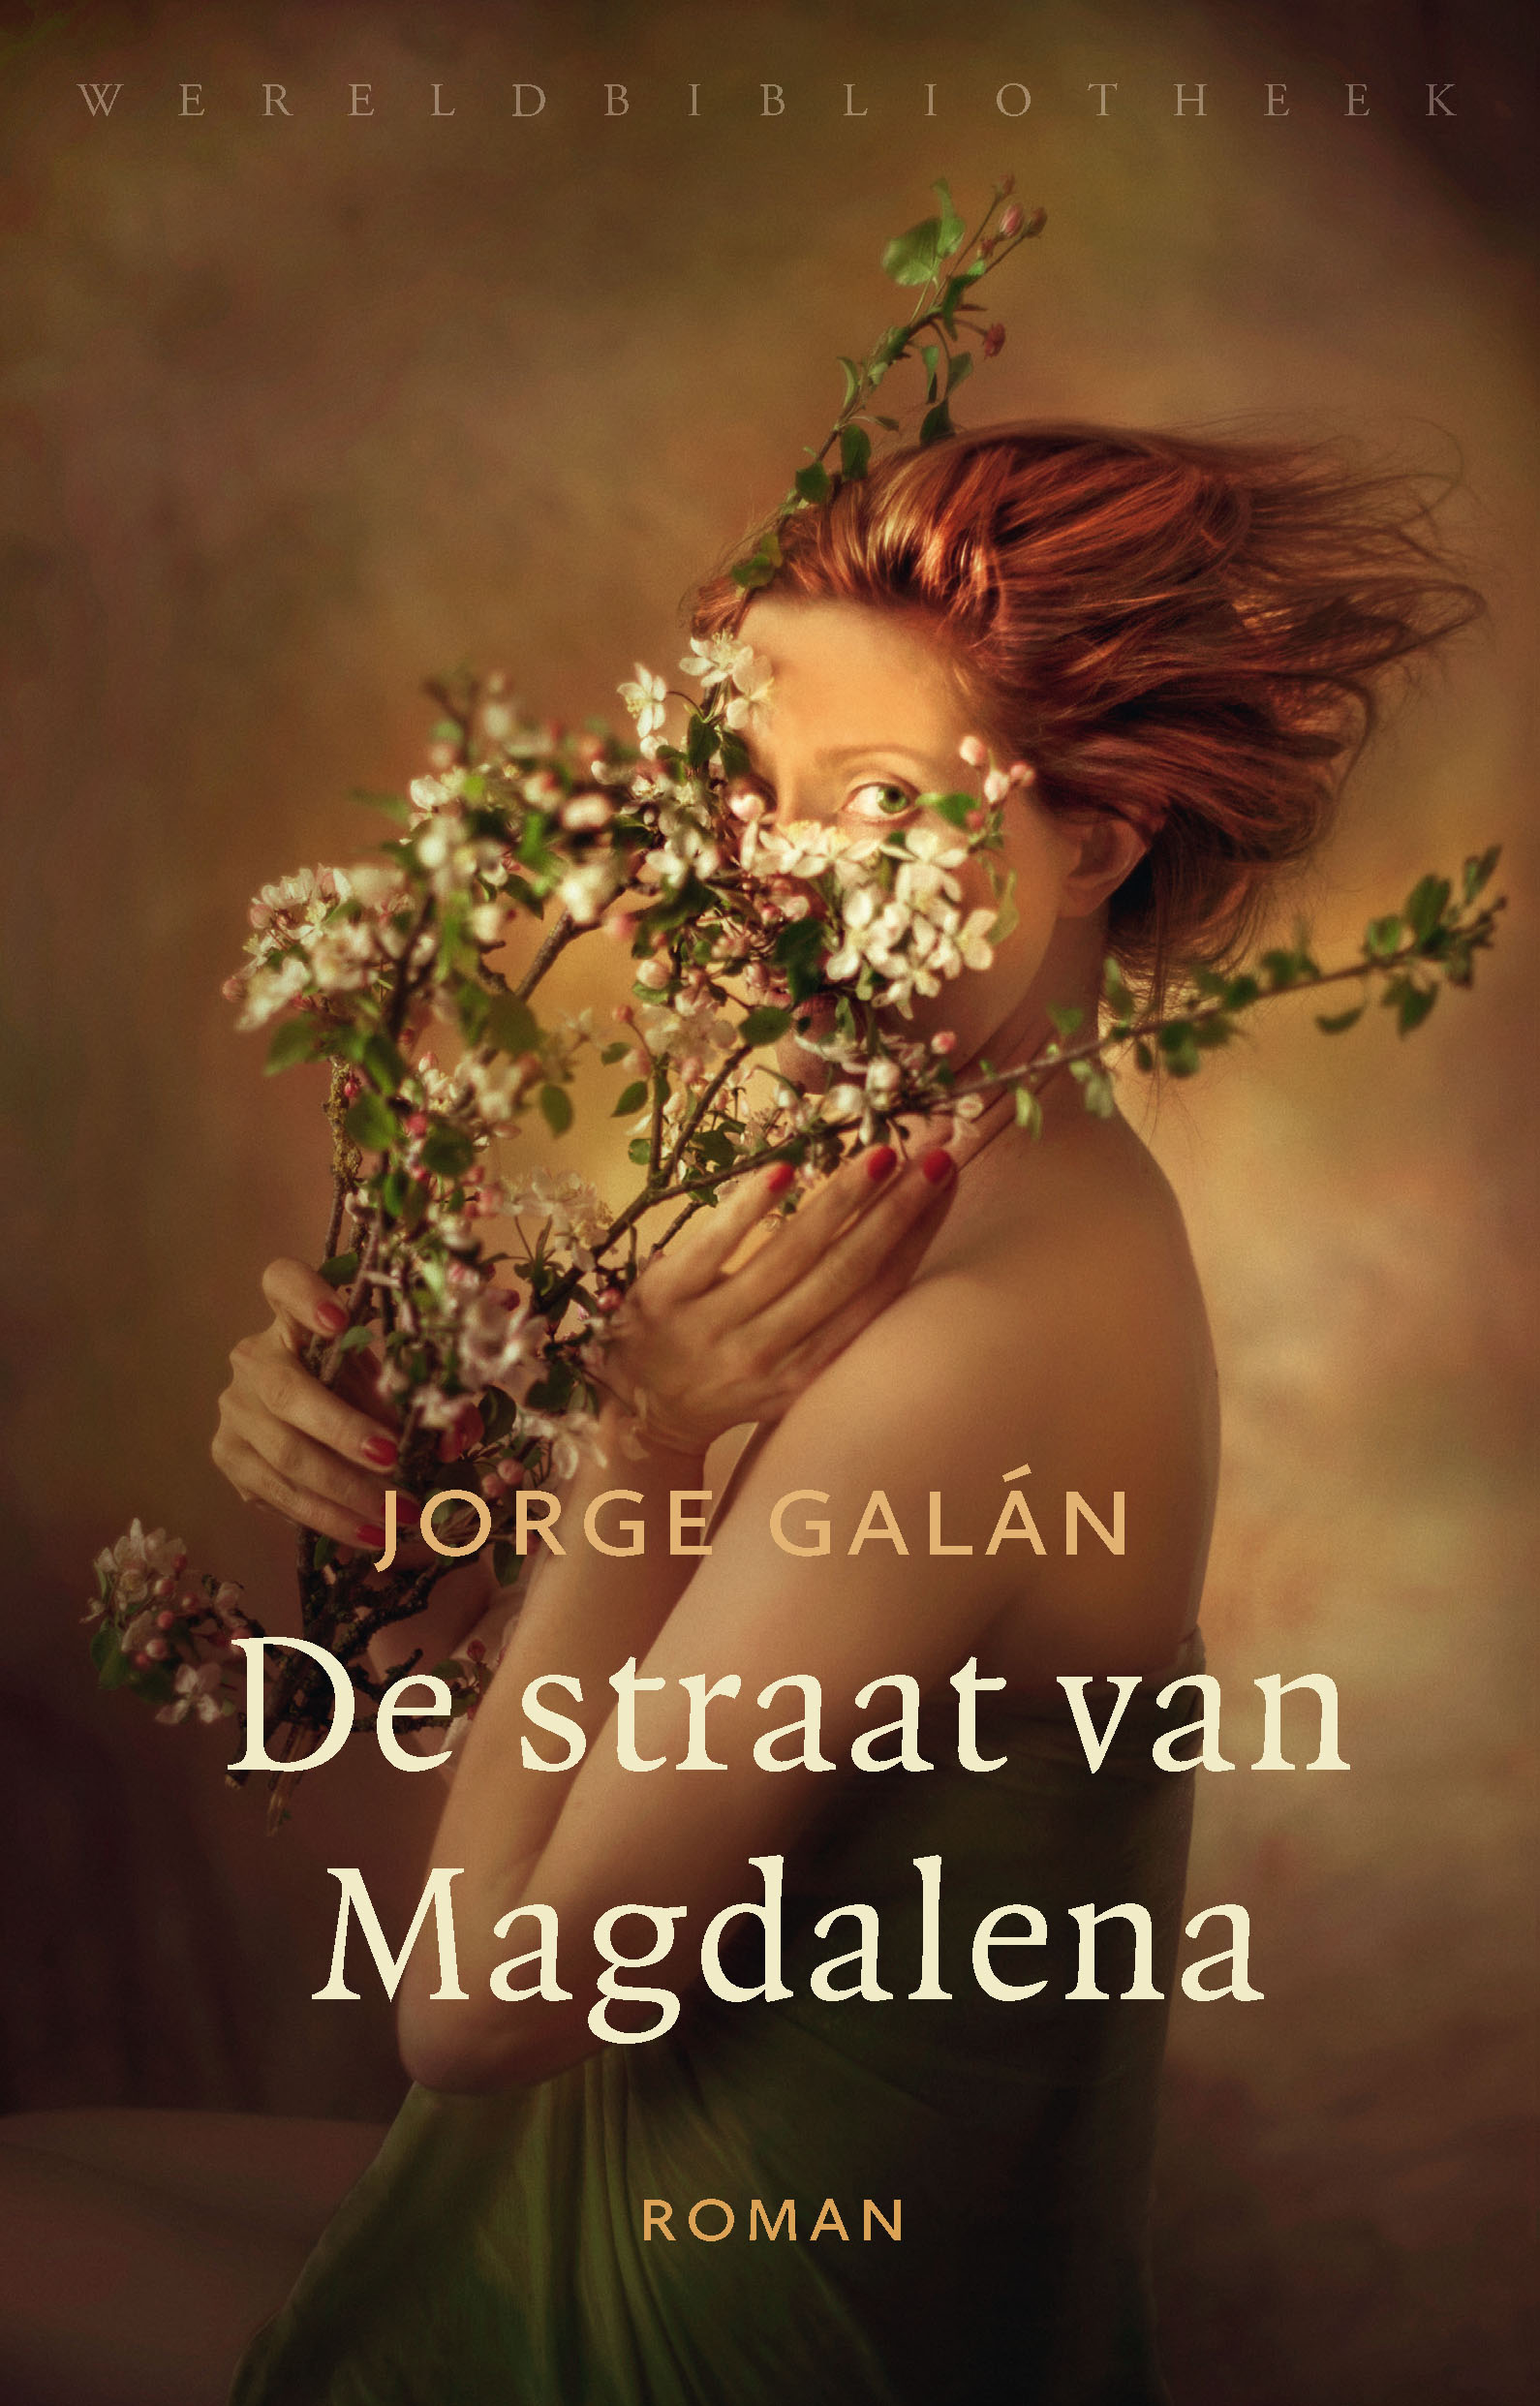 De straat van Magdalena - boekrecensie